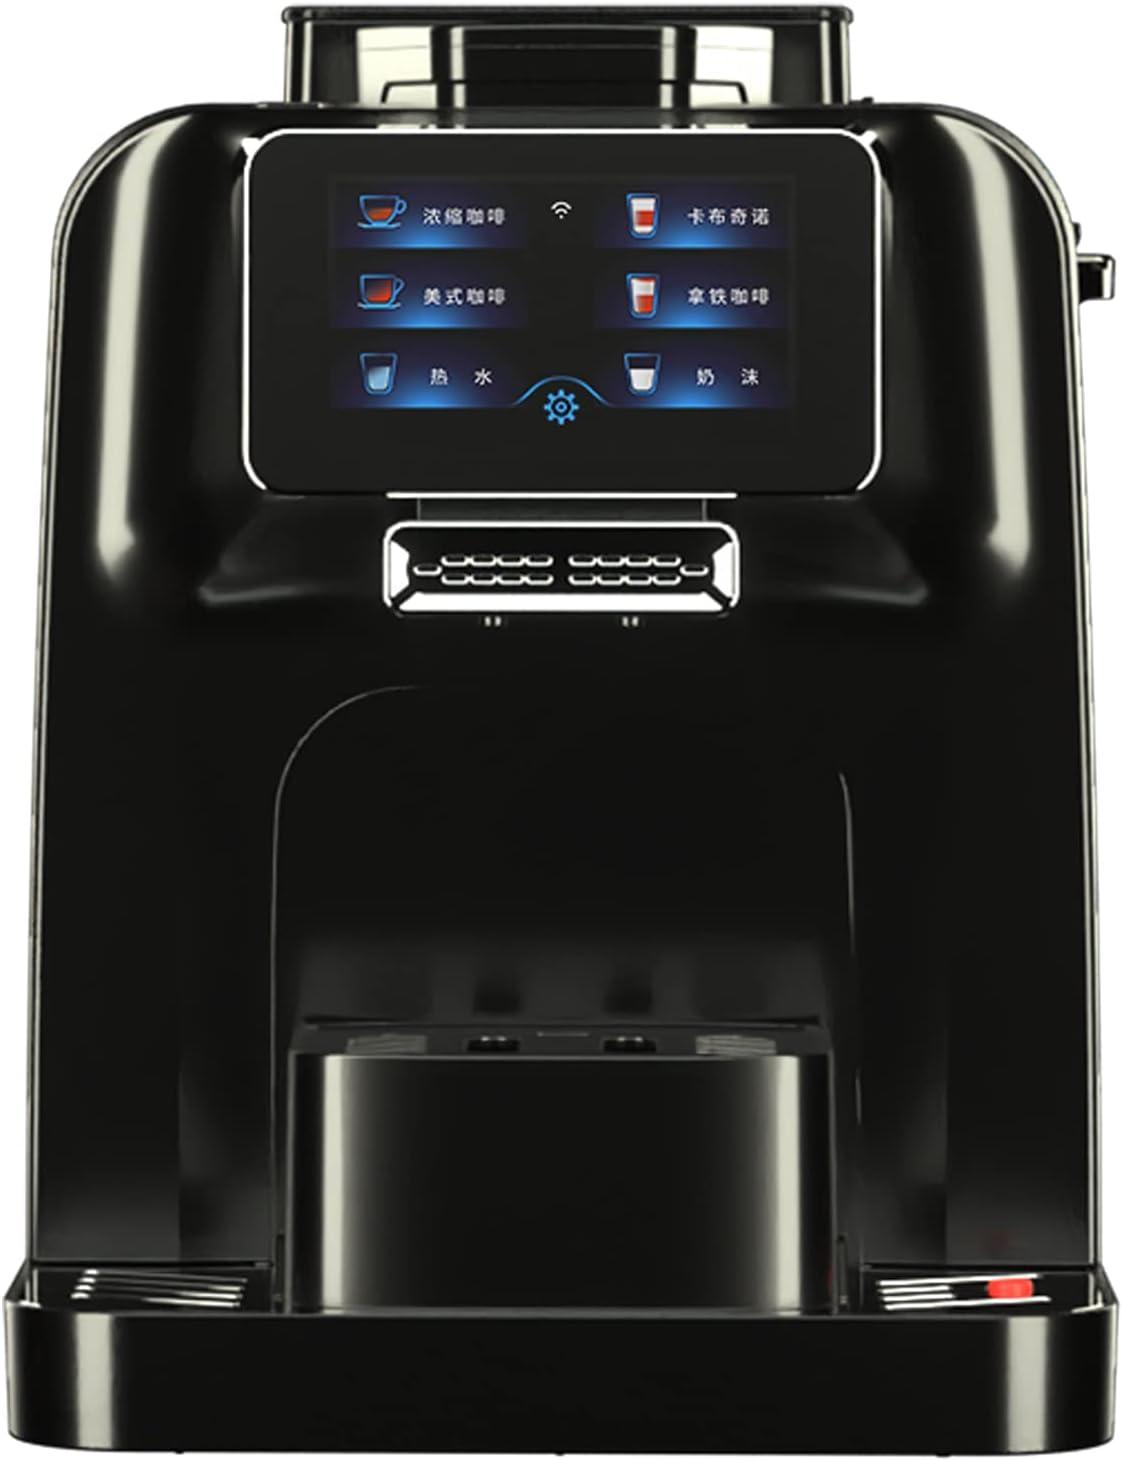 Mcilpoog Super-automatic Espresso Coffee Machine